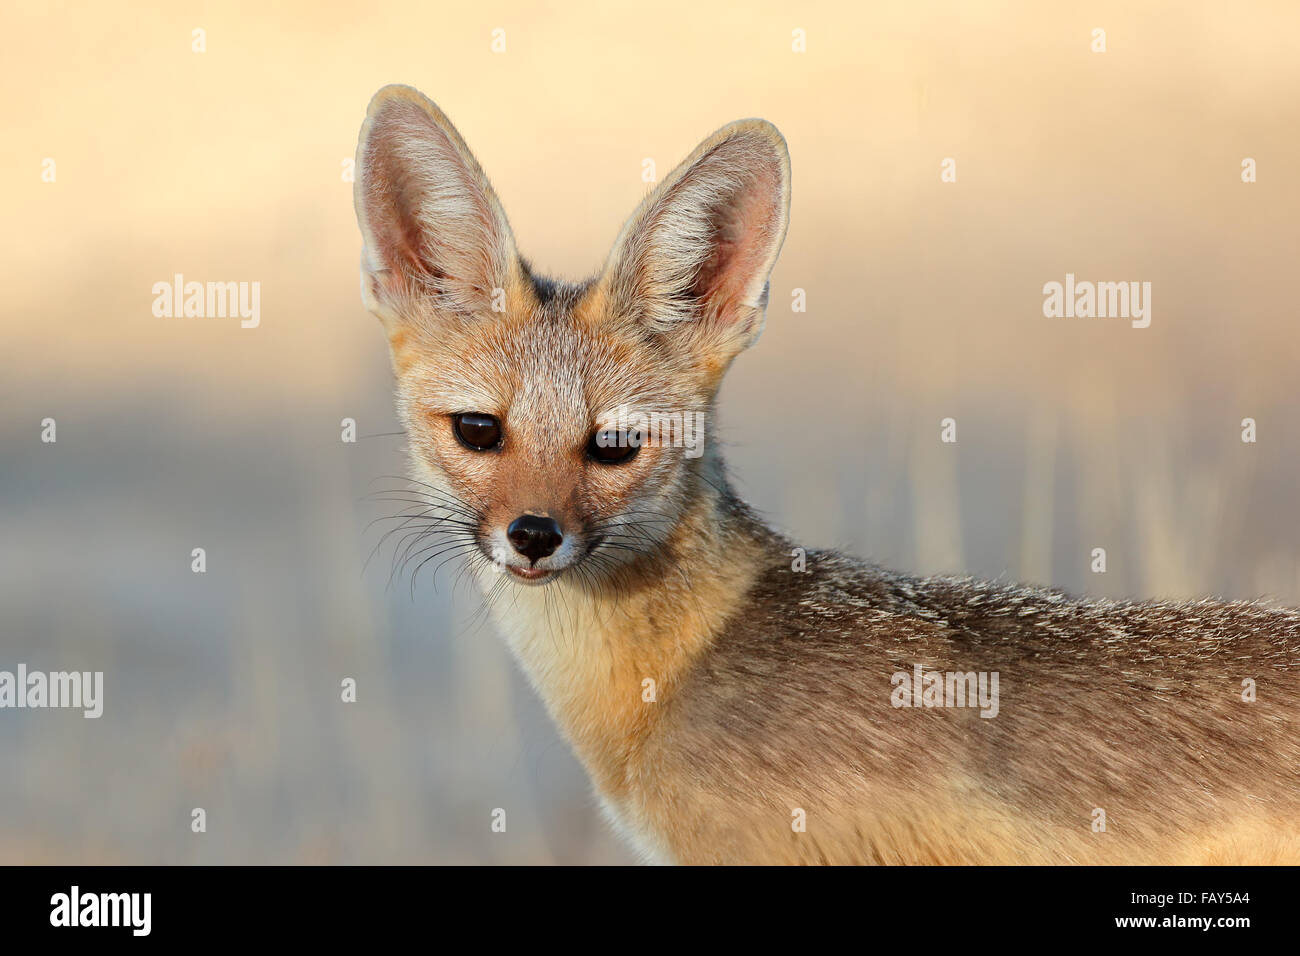 Portrait of a Cape fox (Vulpes chama), Kalahari desert, South Africa - Stock Image